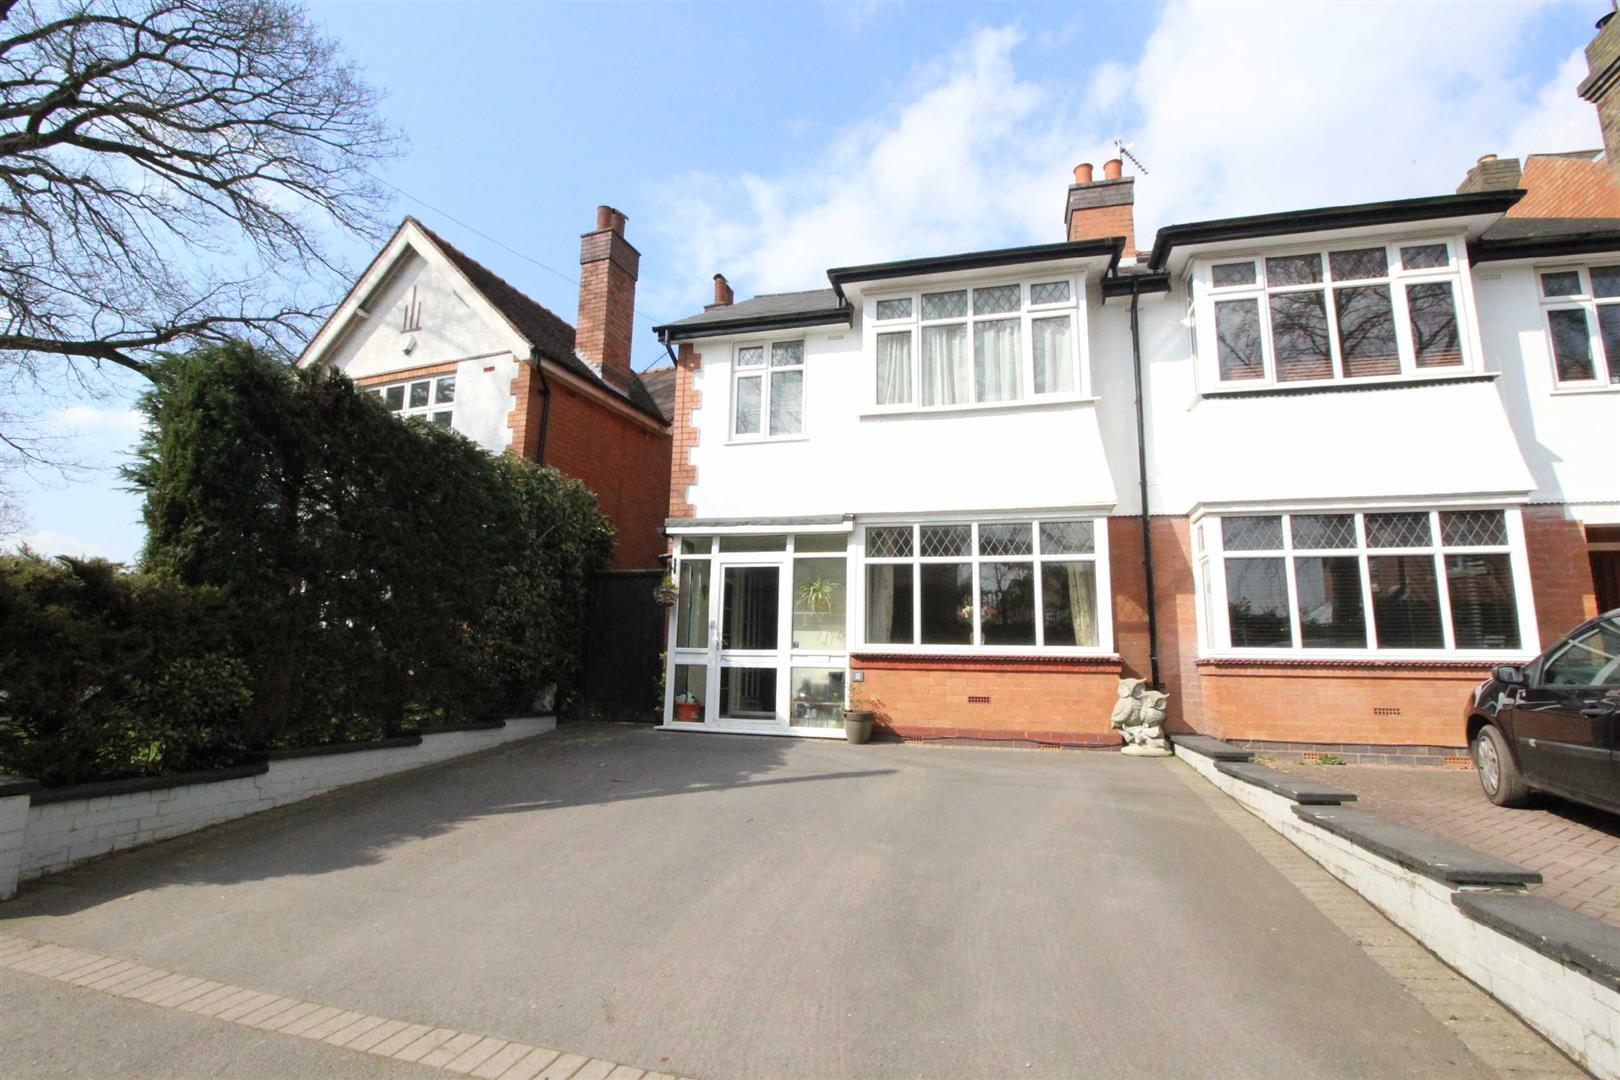 3 Bedrooms Semi Detached House for sale in Marlpit Lane, Headless Cross, Redditch